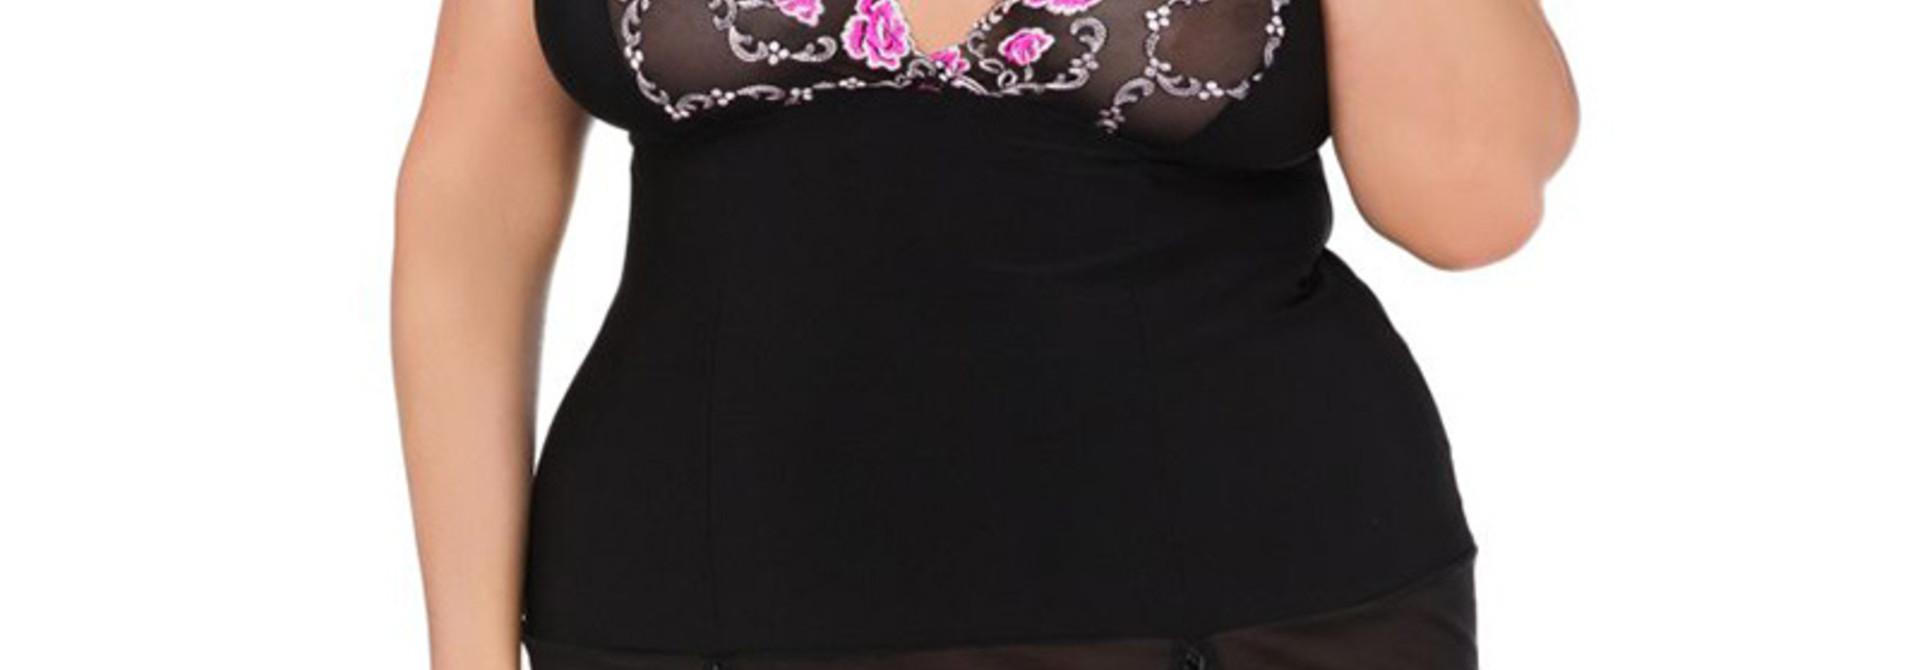 Plussize slipdress zwart met roze